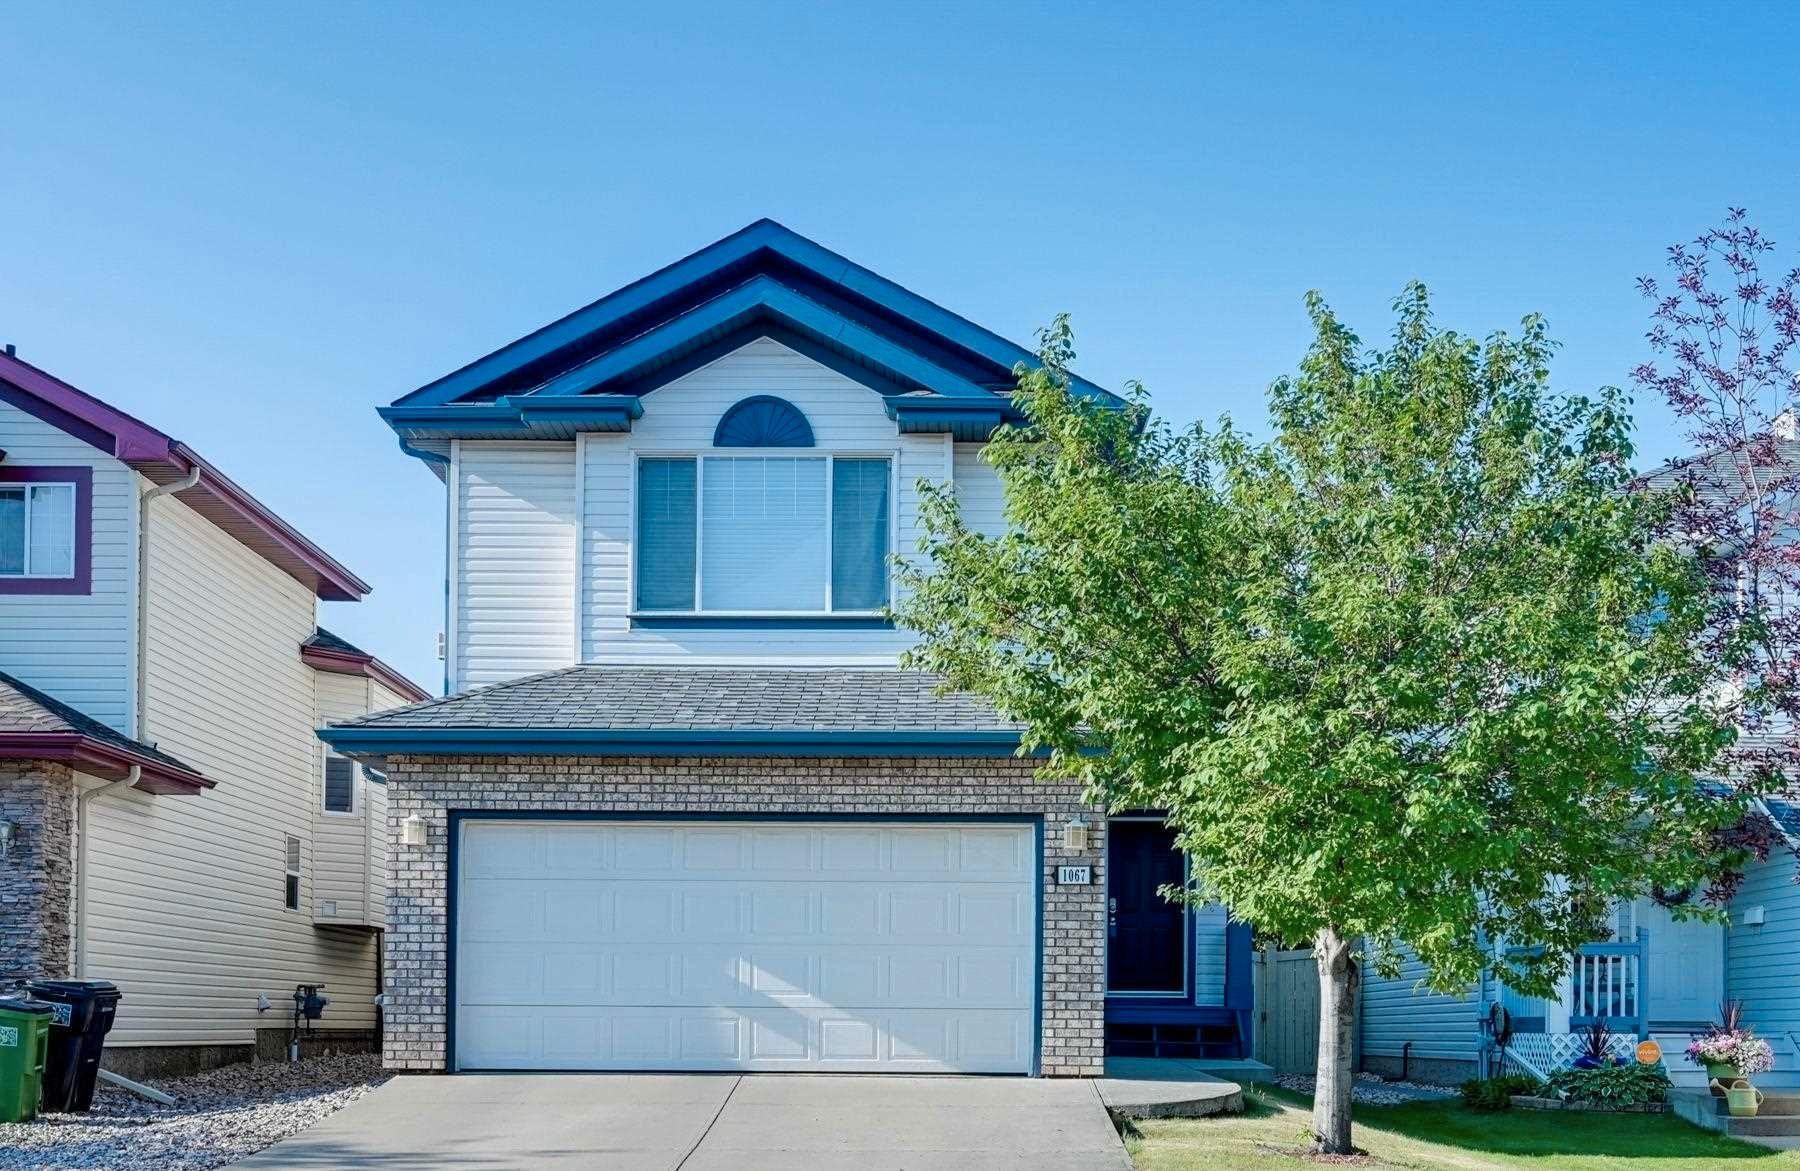 Main Photo: 1067 LEGER Boulevard in Edmonton: Zone 14 House for sale : MLS®# E4249340